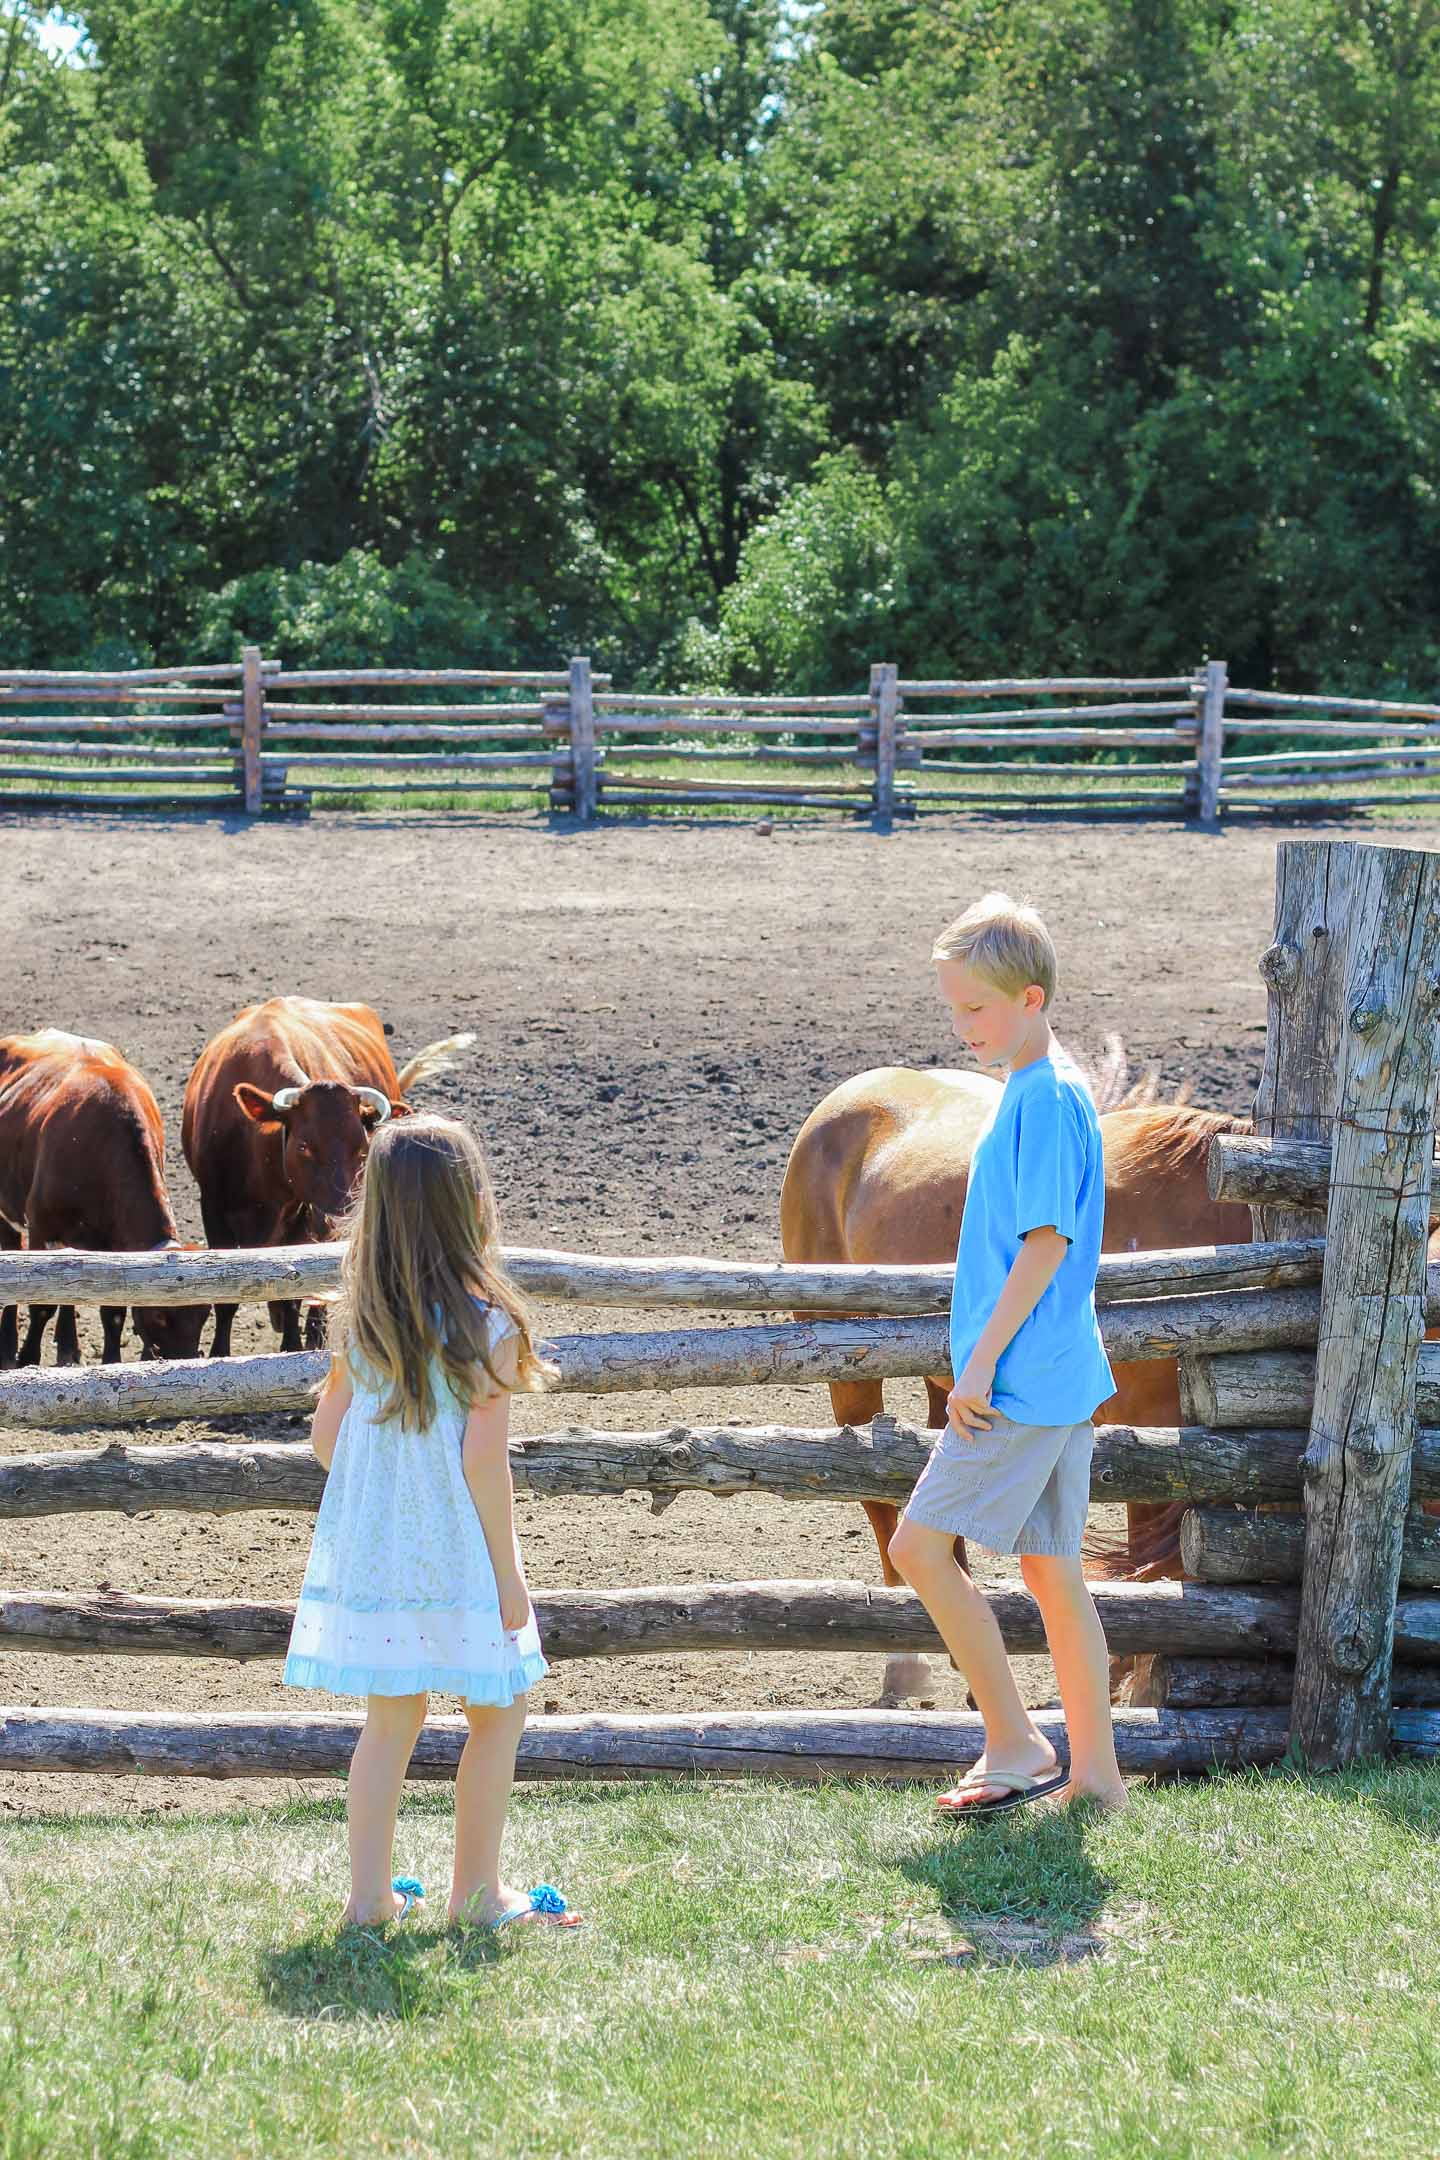 Two kids in a barnyard.